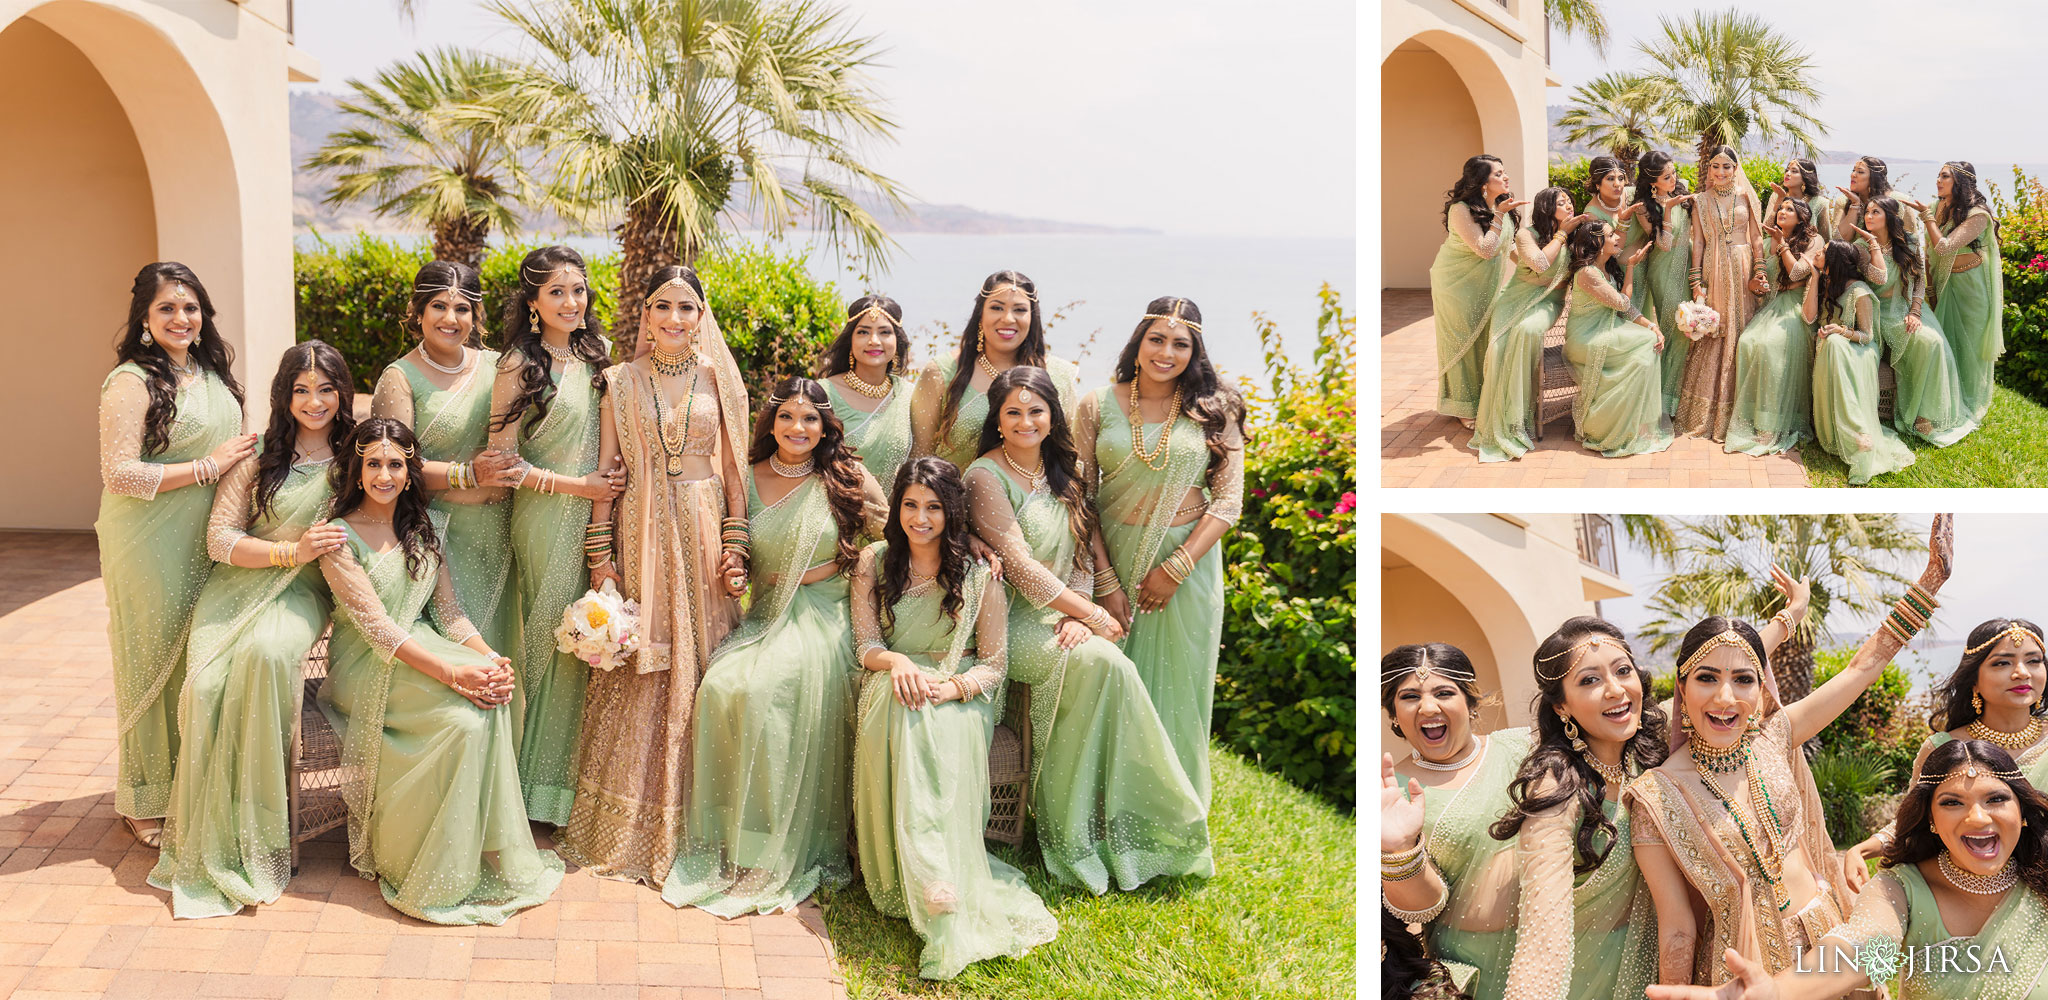 010 terranea resort palos verdes bridal party indian wedding photography